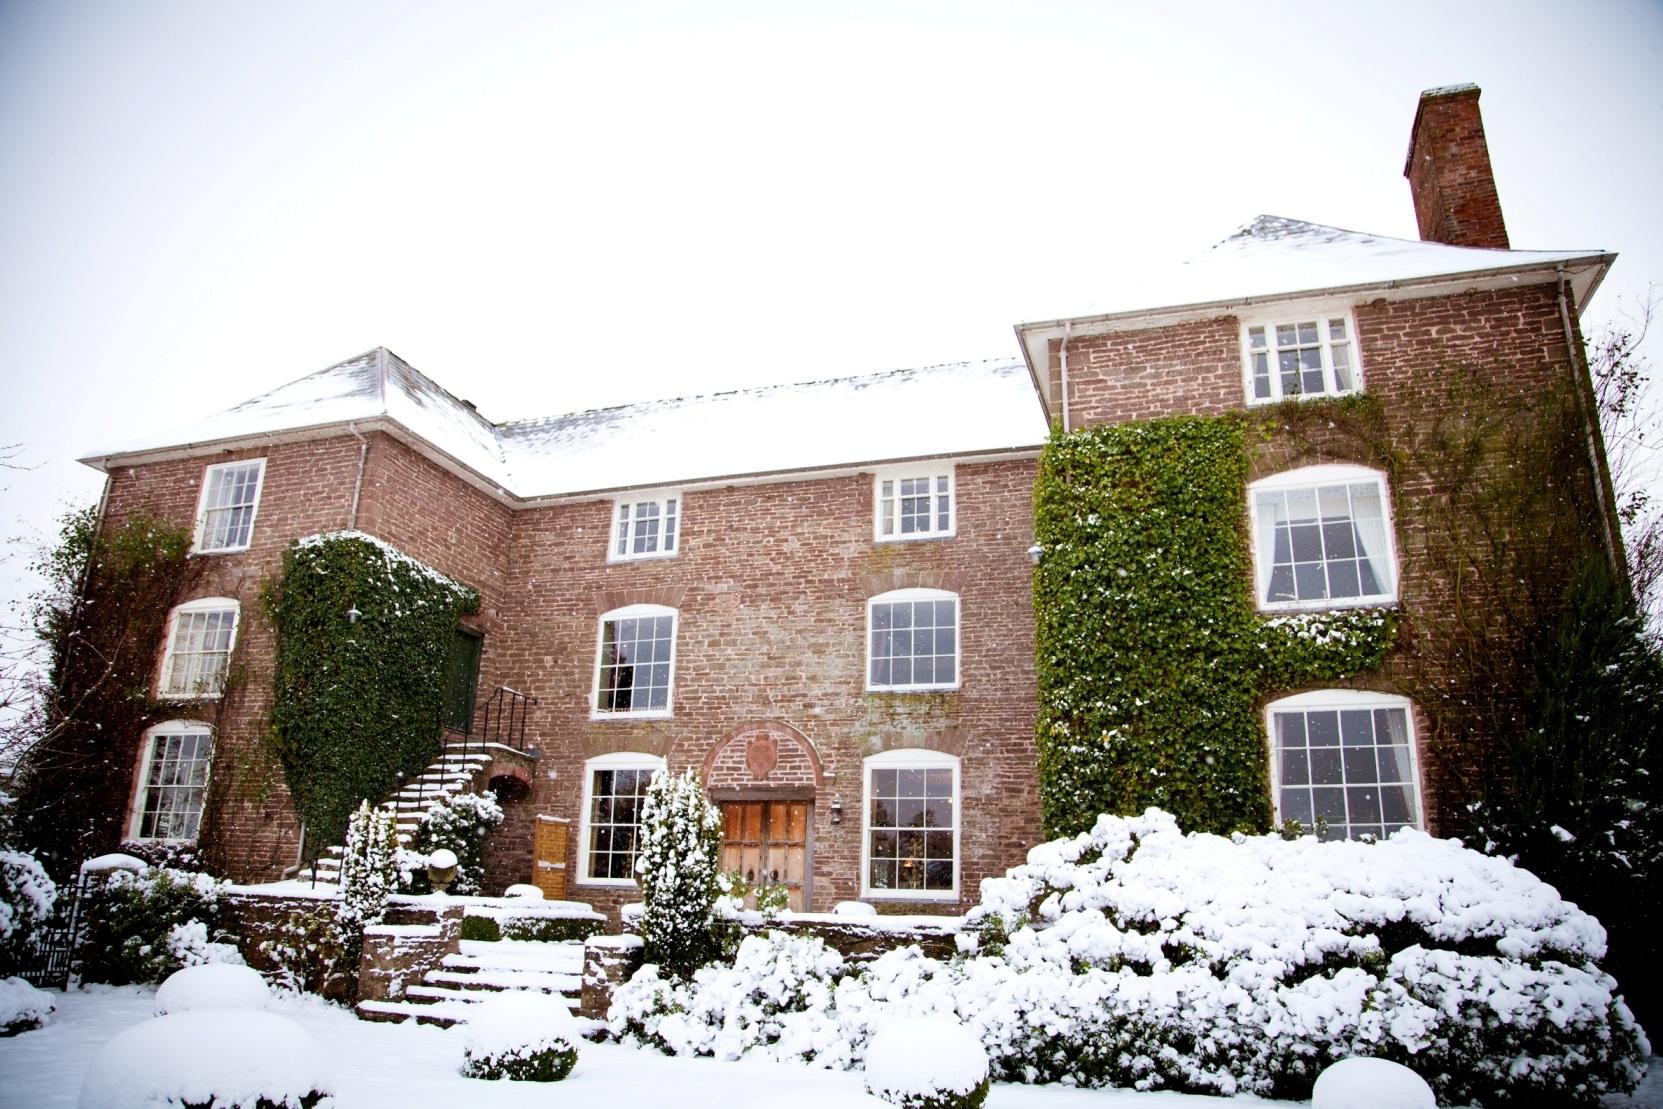 31 Winter Weddings at Dewsall Court